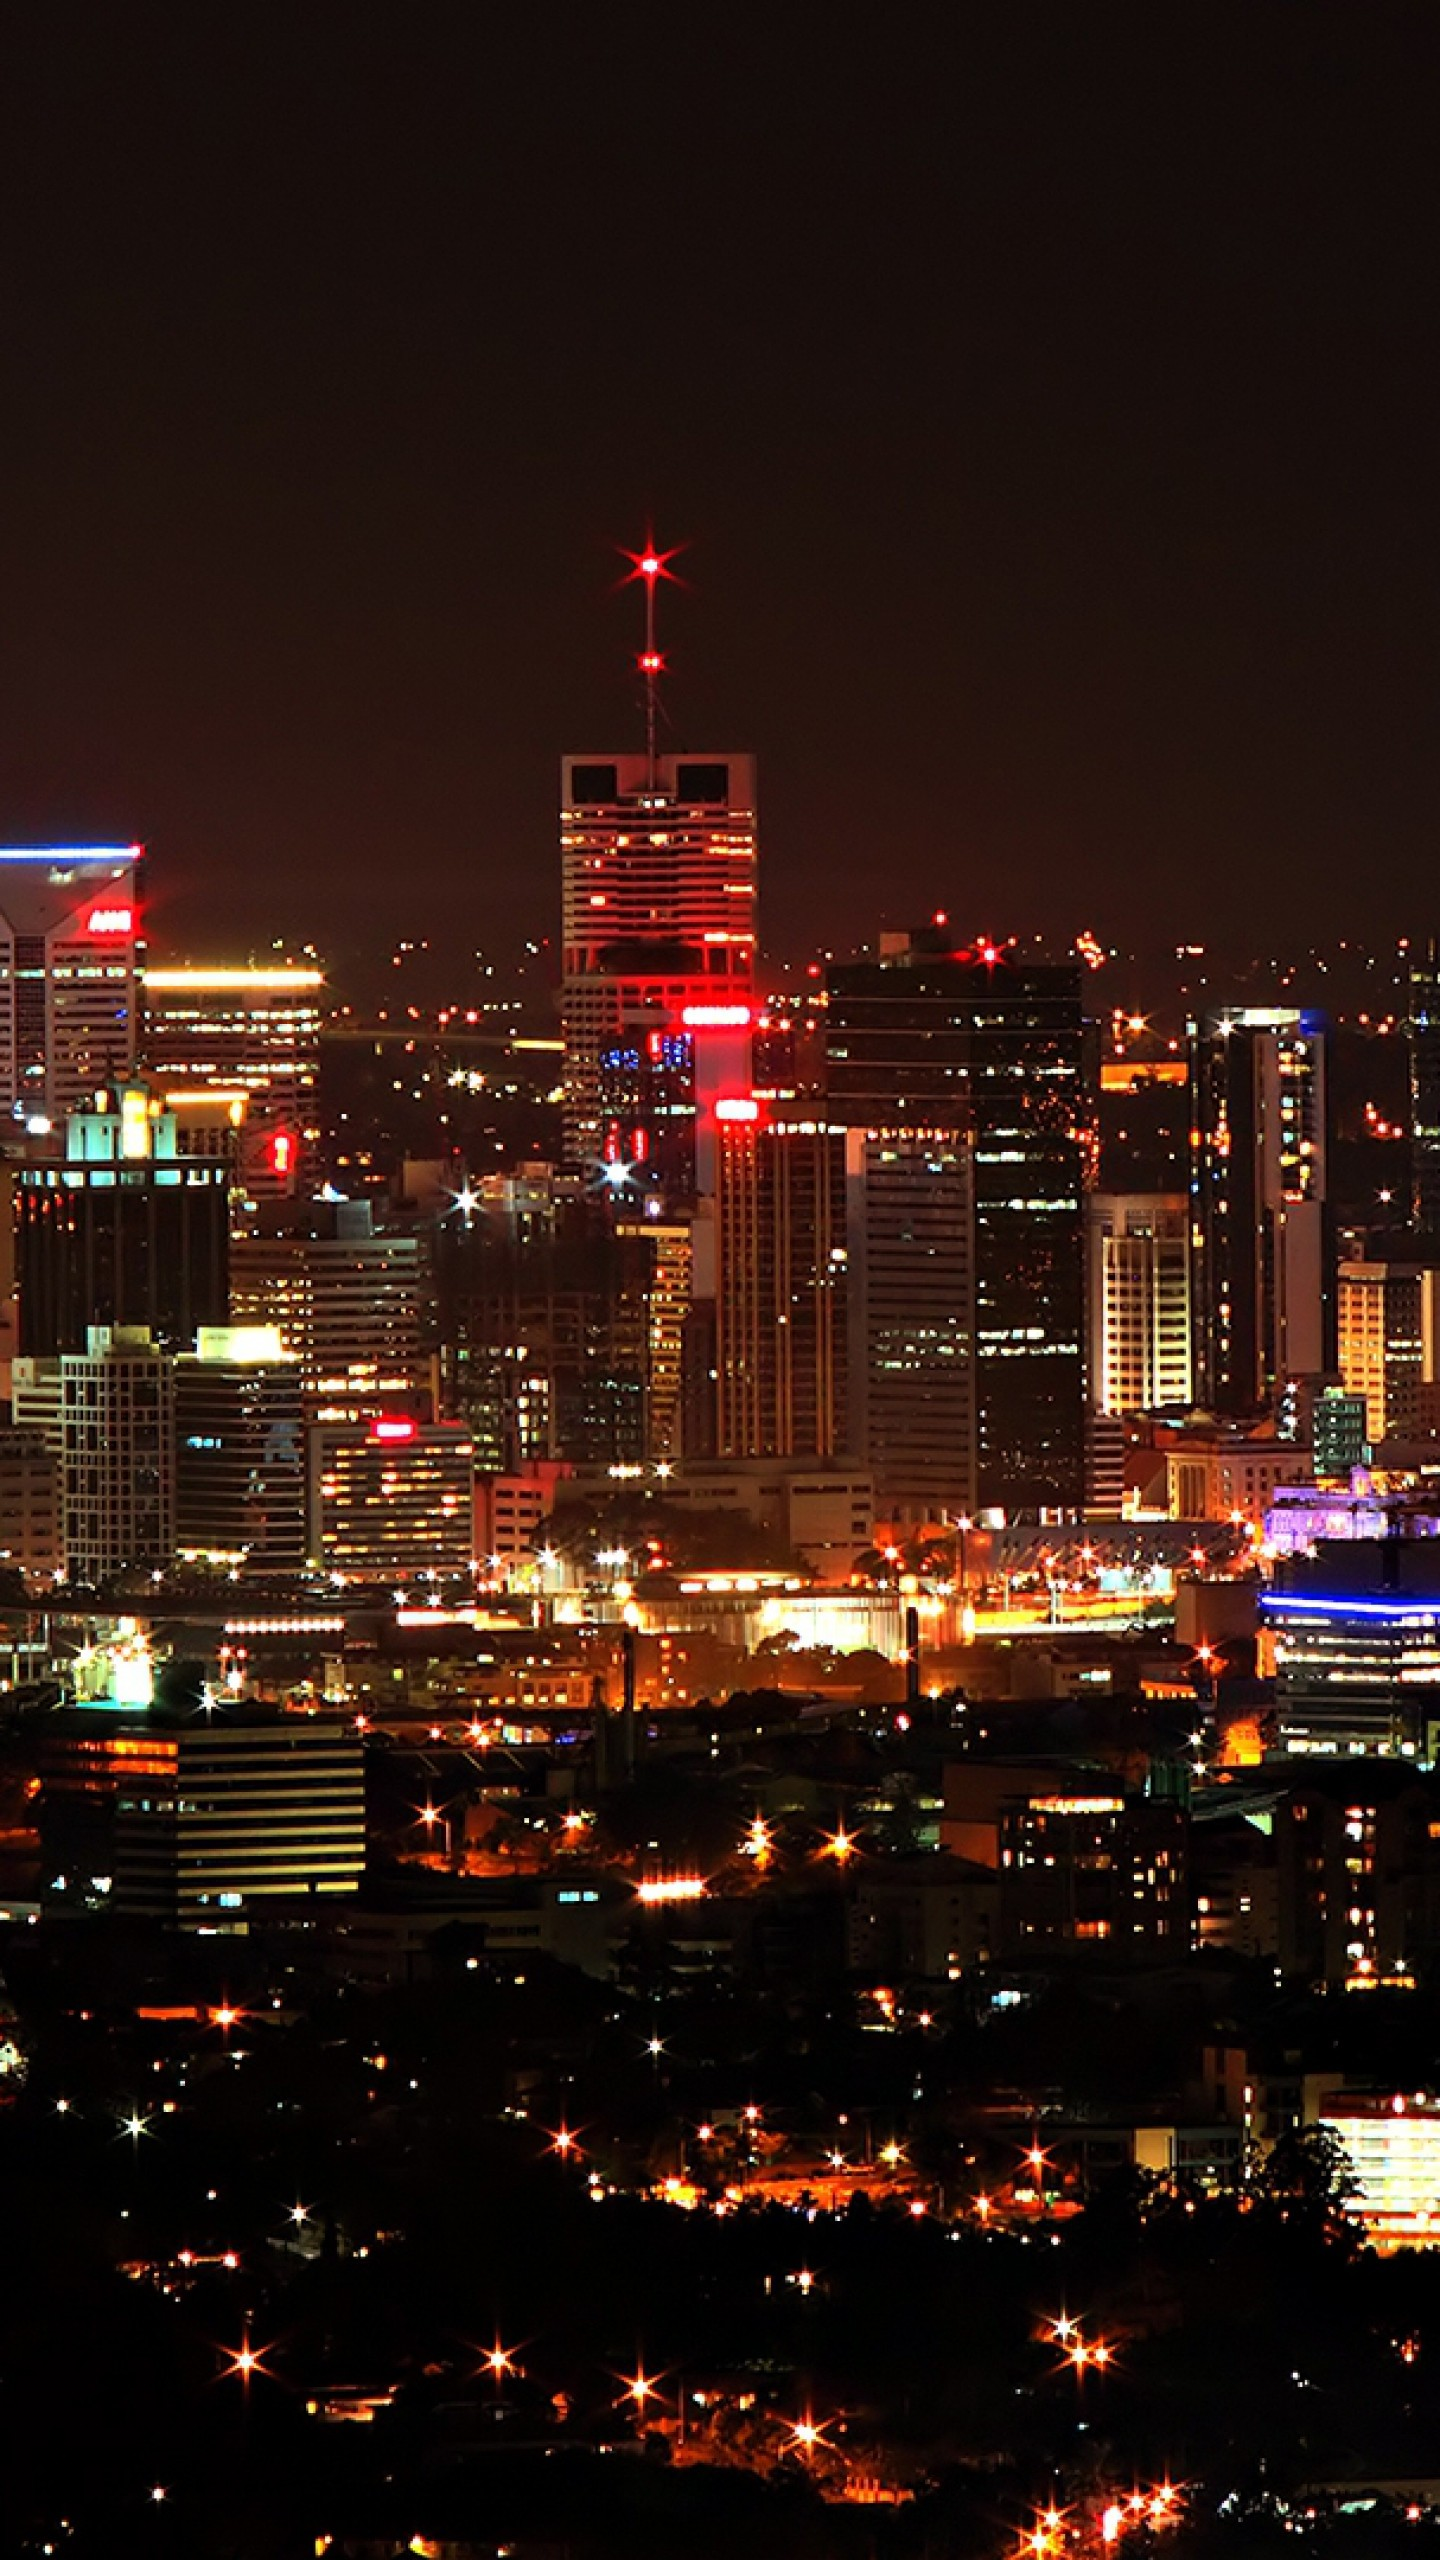 Wallpaper city, night, skyscrapers, top view, sky, city lights